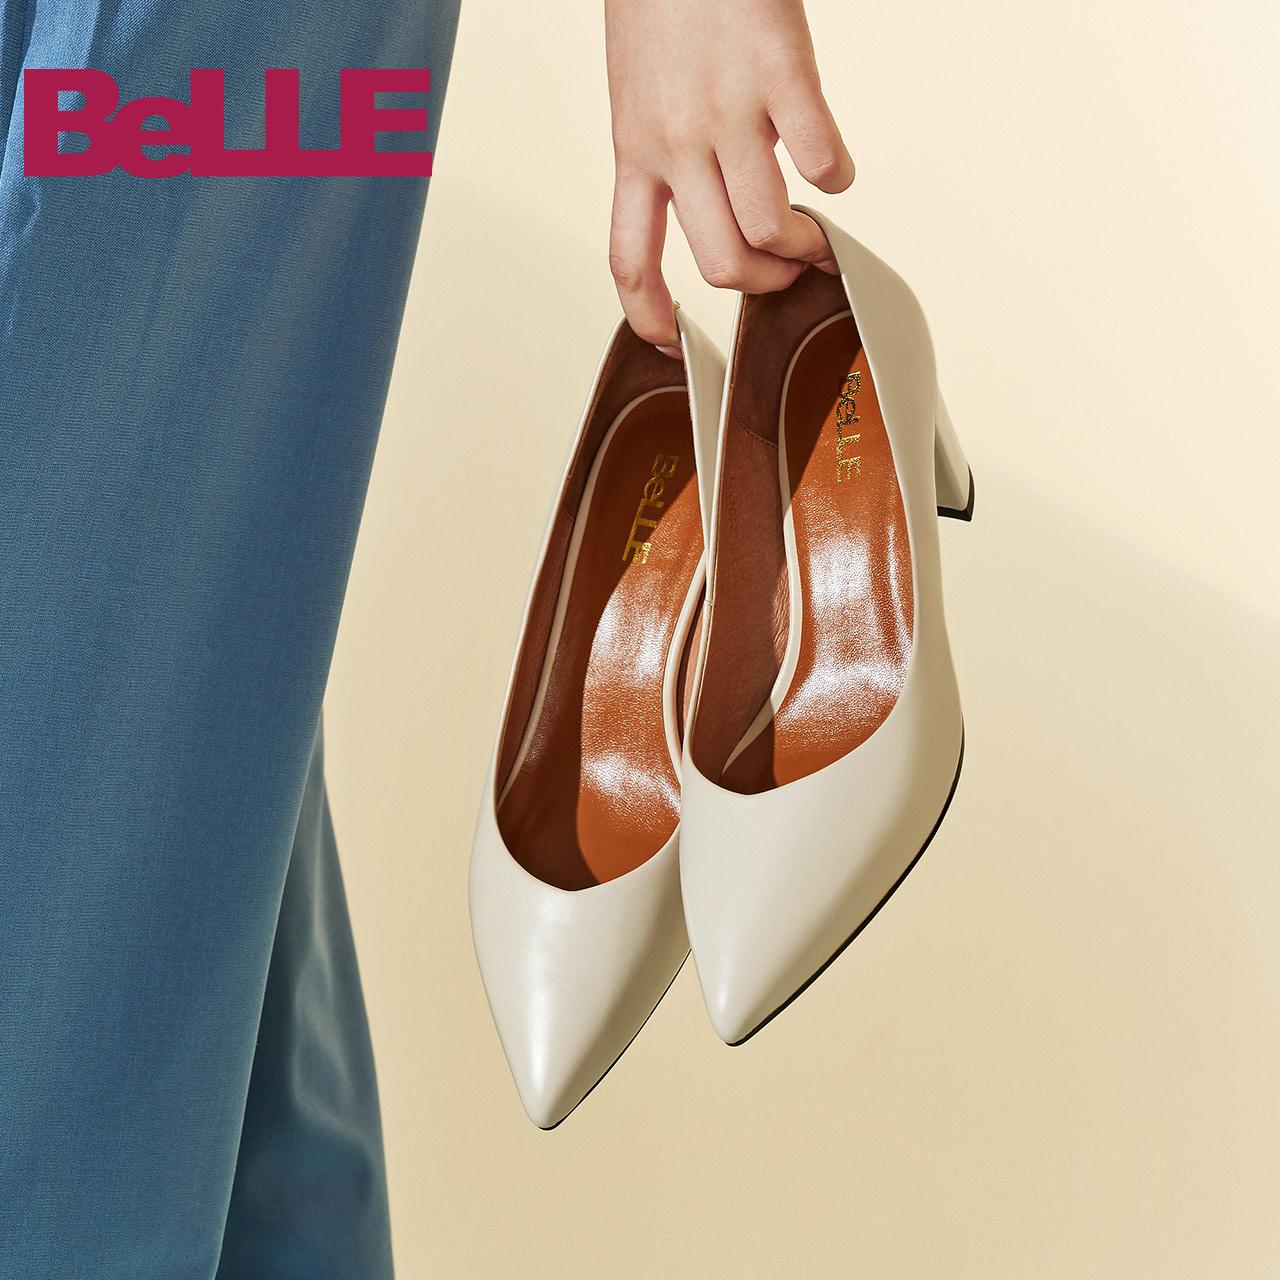 Belle-百丽女鞋2018秋新款羊皮粗跟尖头浅口单鞋18512CQ8